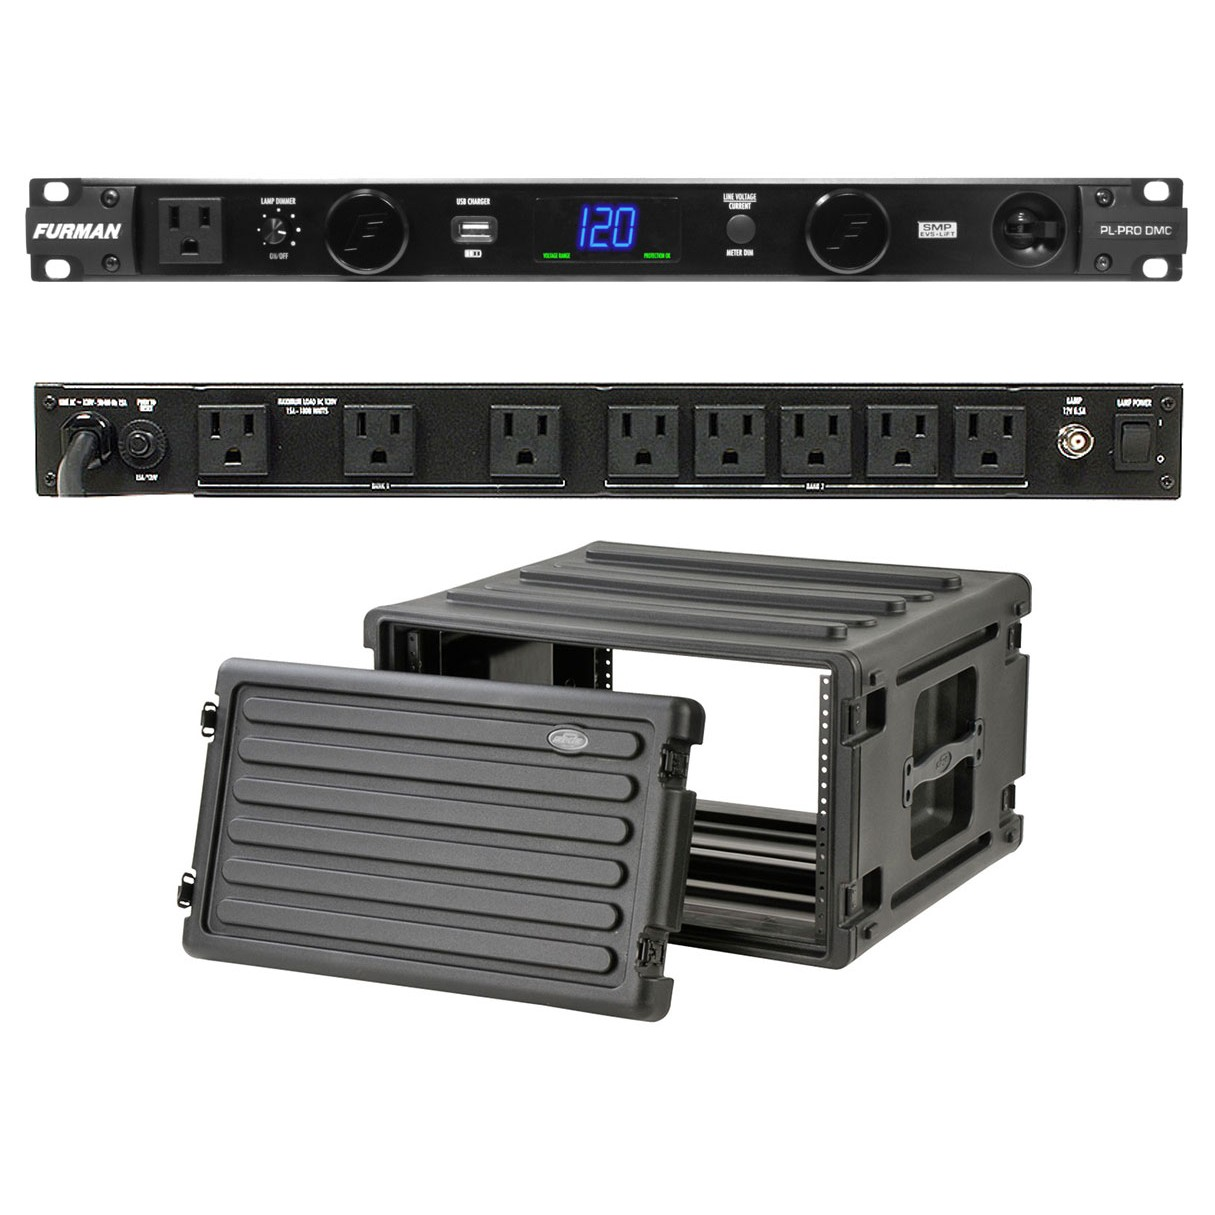 Furman PL-Pro DMC + SKB 1SKB-R6U